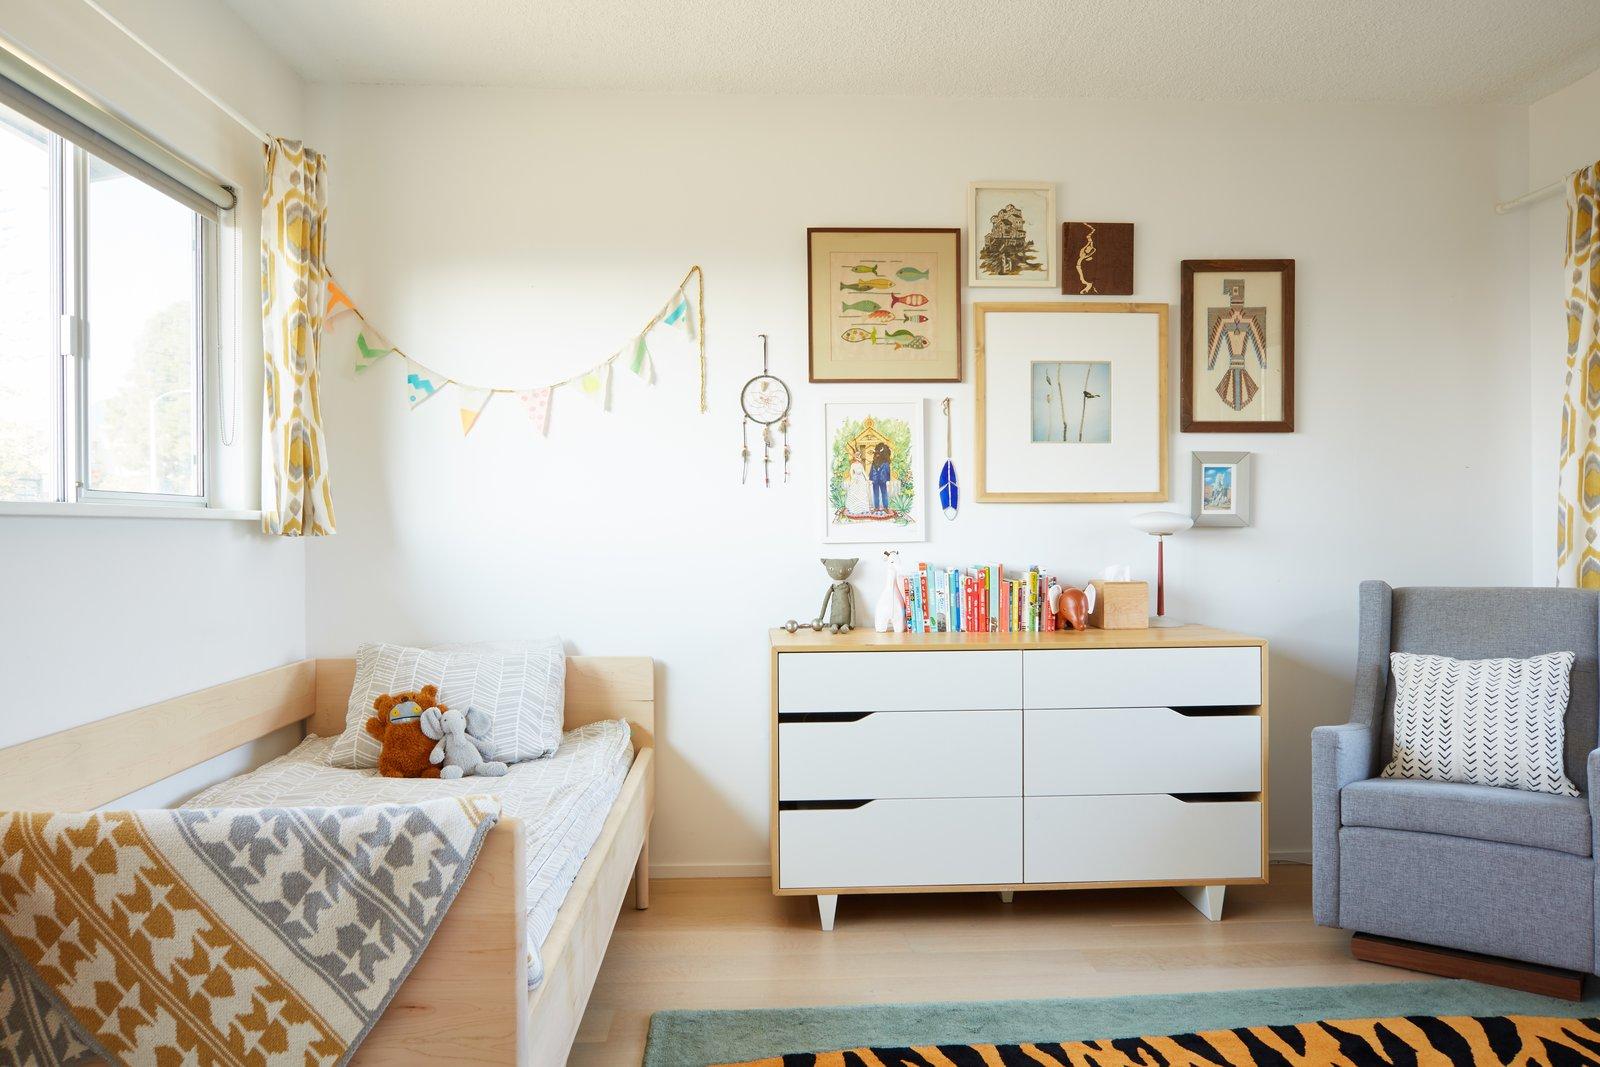 Kids, Bed, Light Hardwood, Bedroom, Chair, Dresser, Toddler, Neutral, and Rug Kids Bedroom  Kids Dresser Light Hardwood Chair Photos from Midcentury Dream House